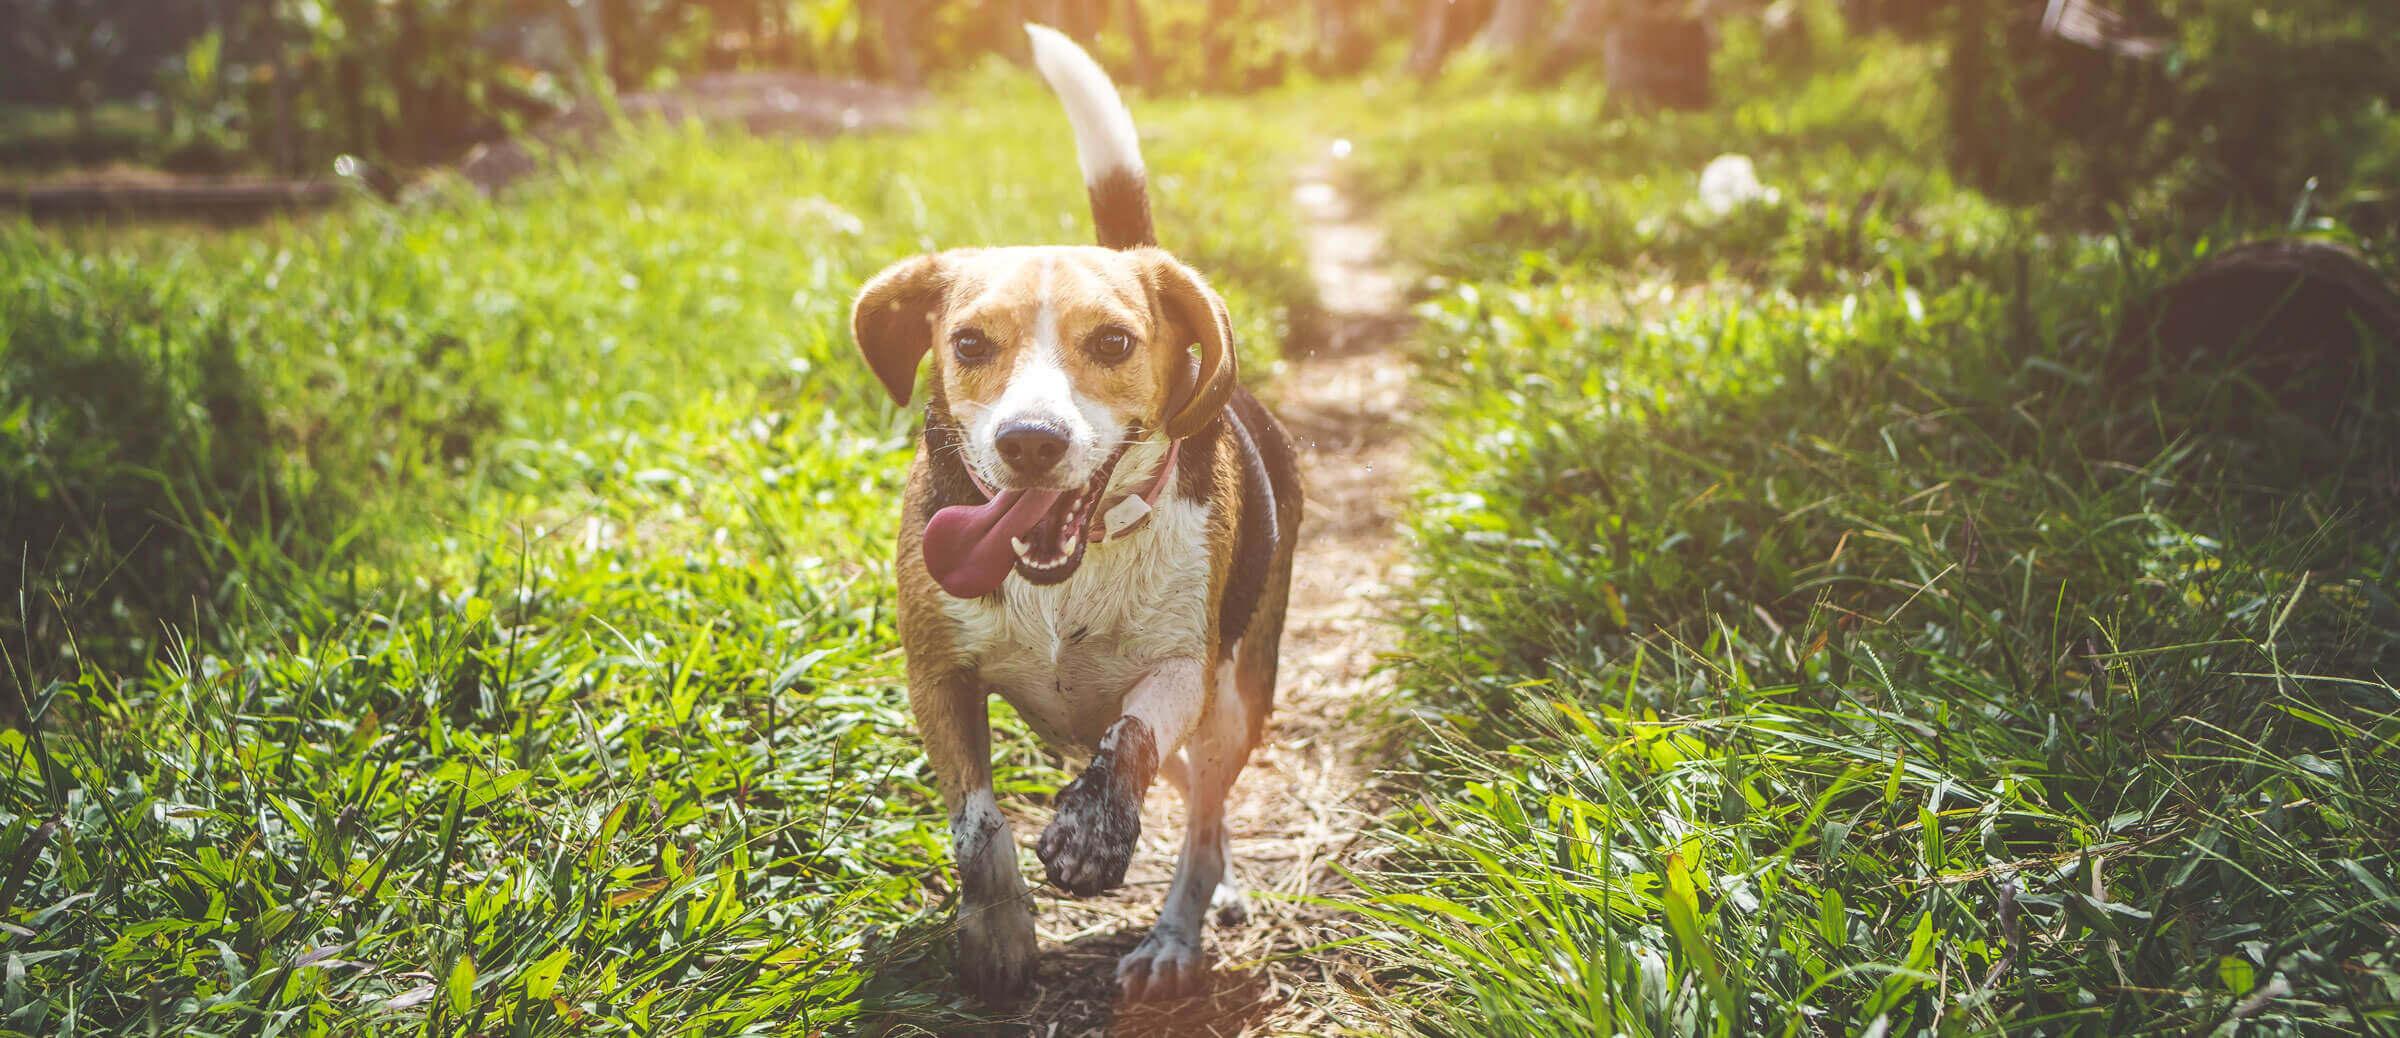 beagle-running